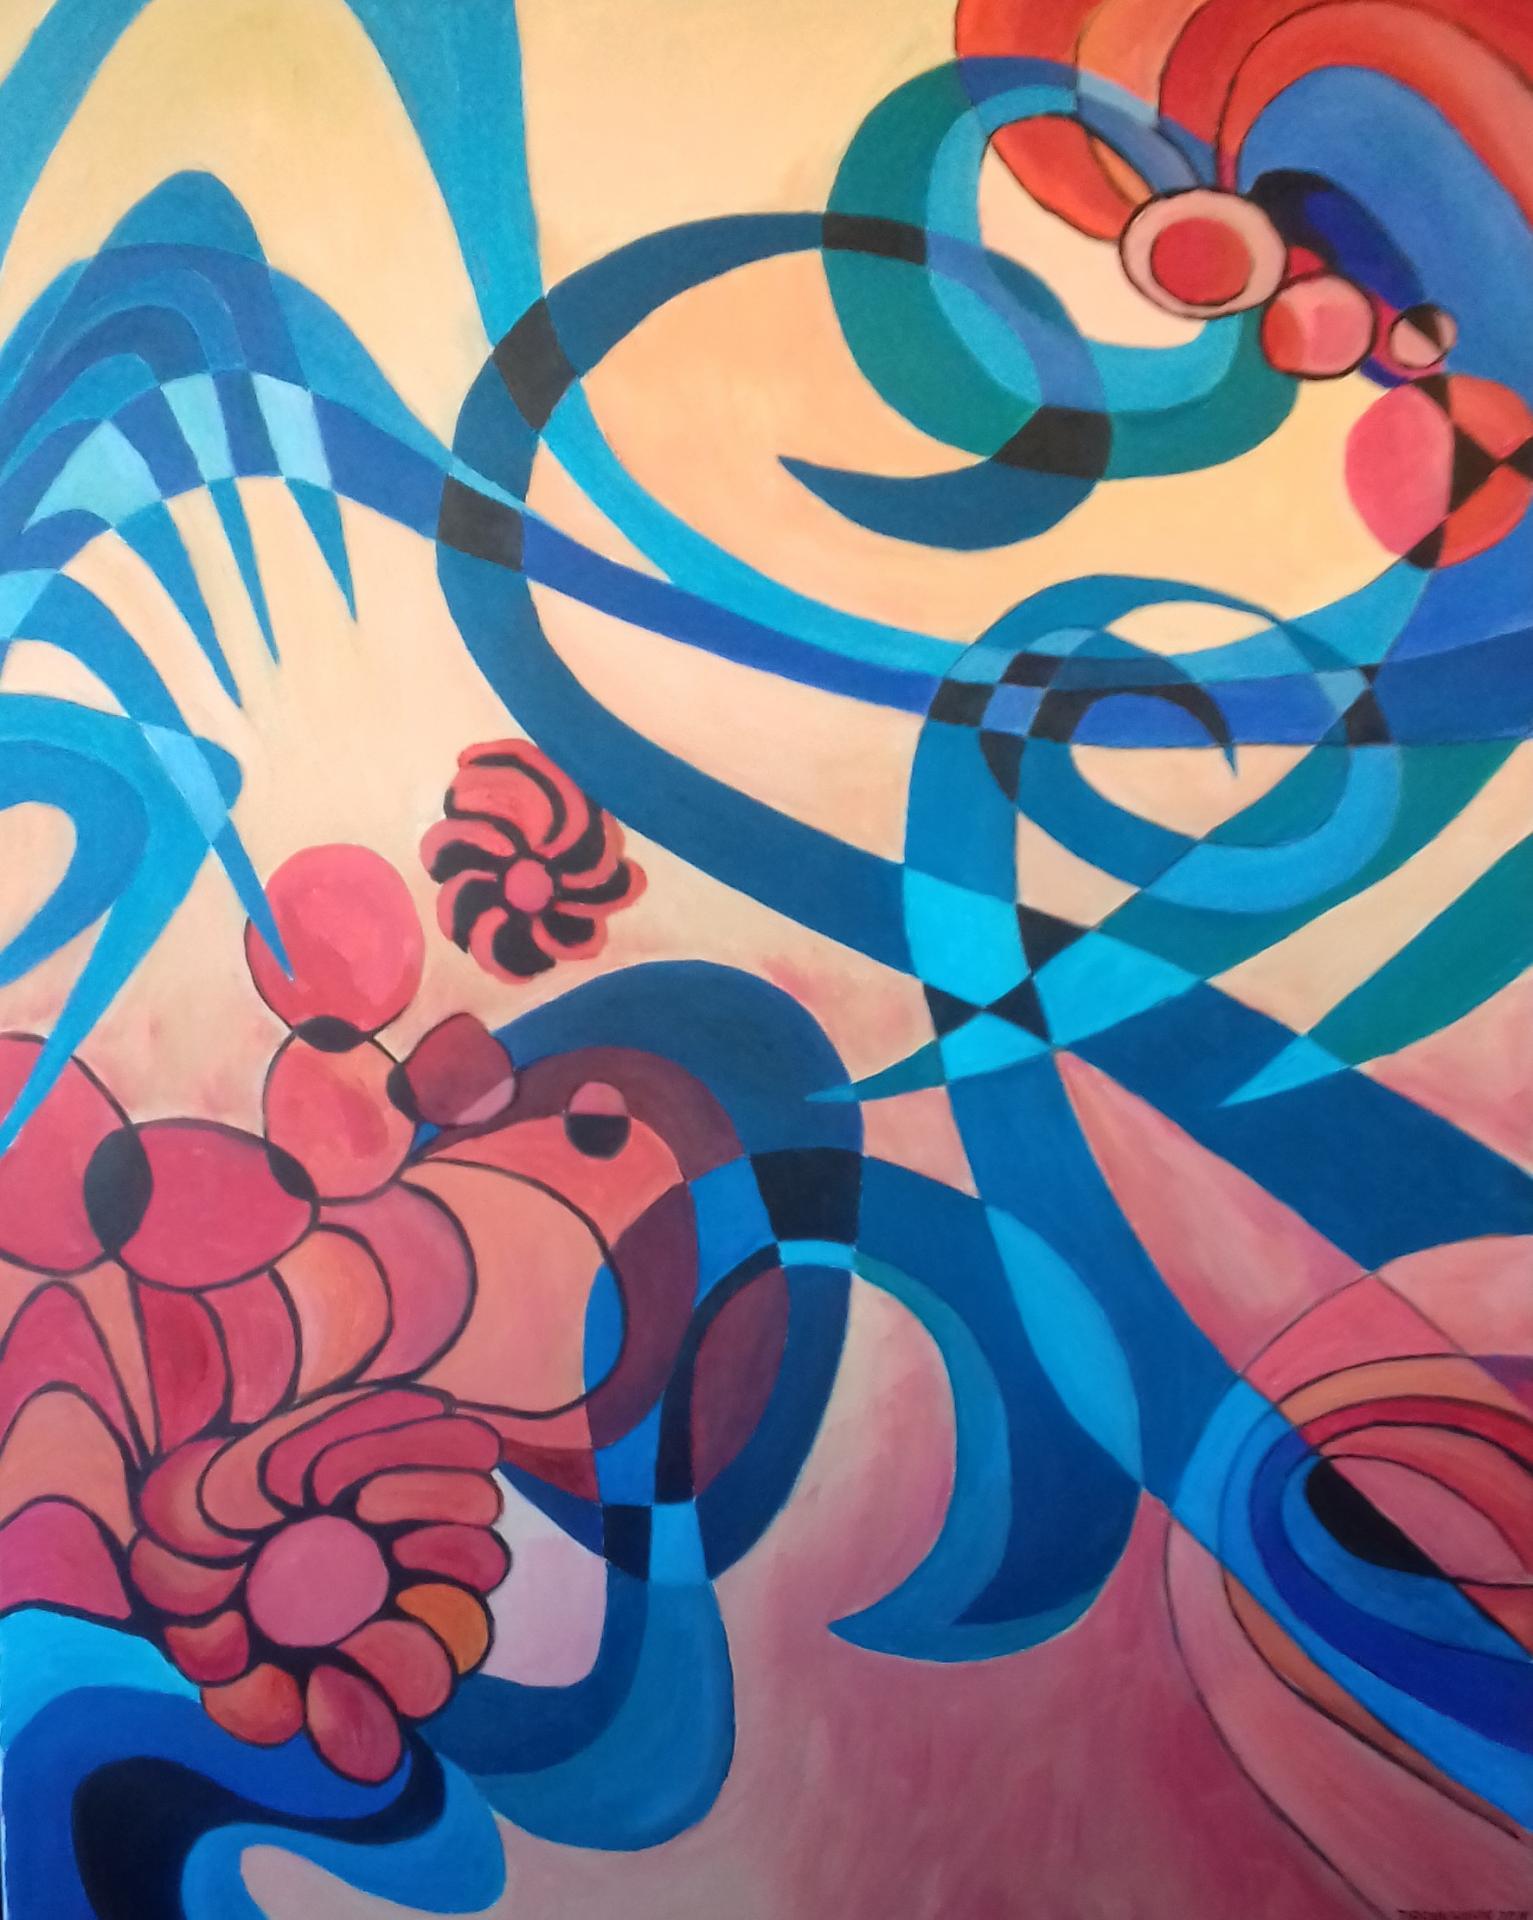 Sumpf   2020  Acryl auf Leinwand   80 x 100 cm